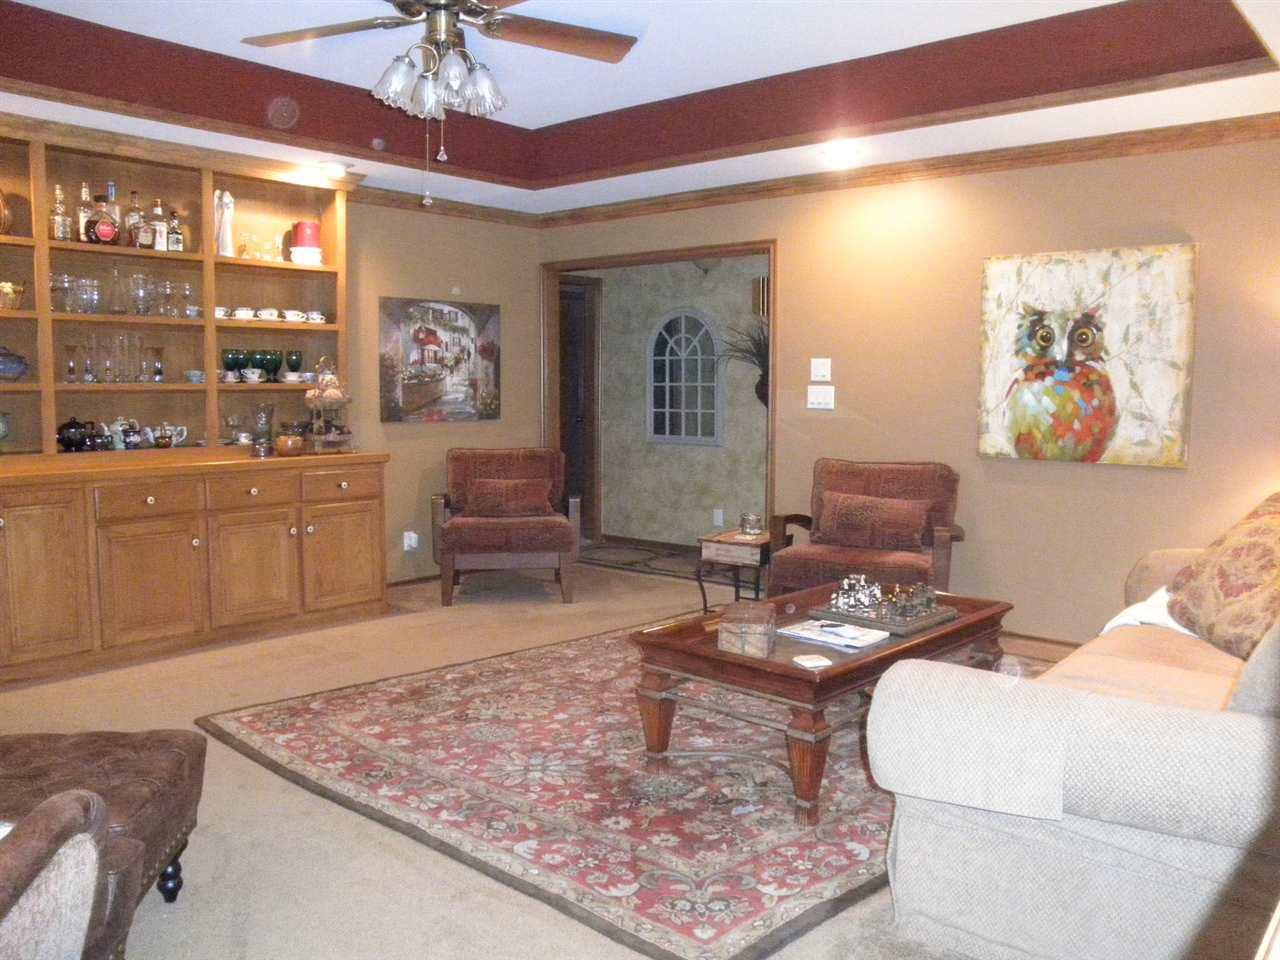 Sold Intraoffice W/MLS | 2800 Green Meadow Ponca City, OK 74604 6